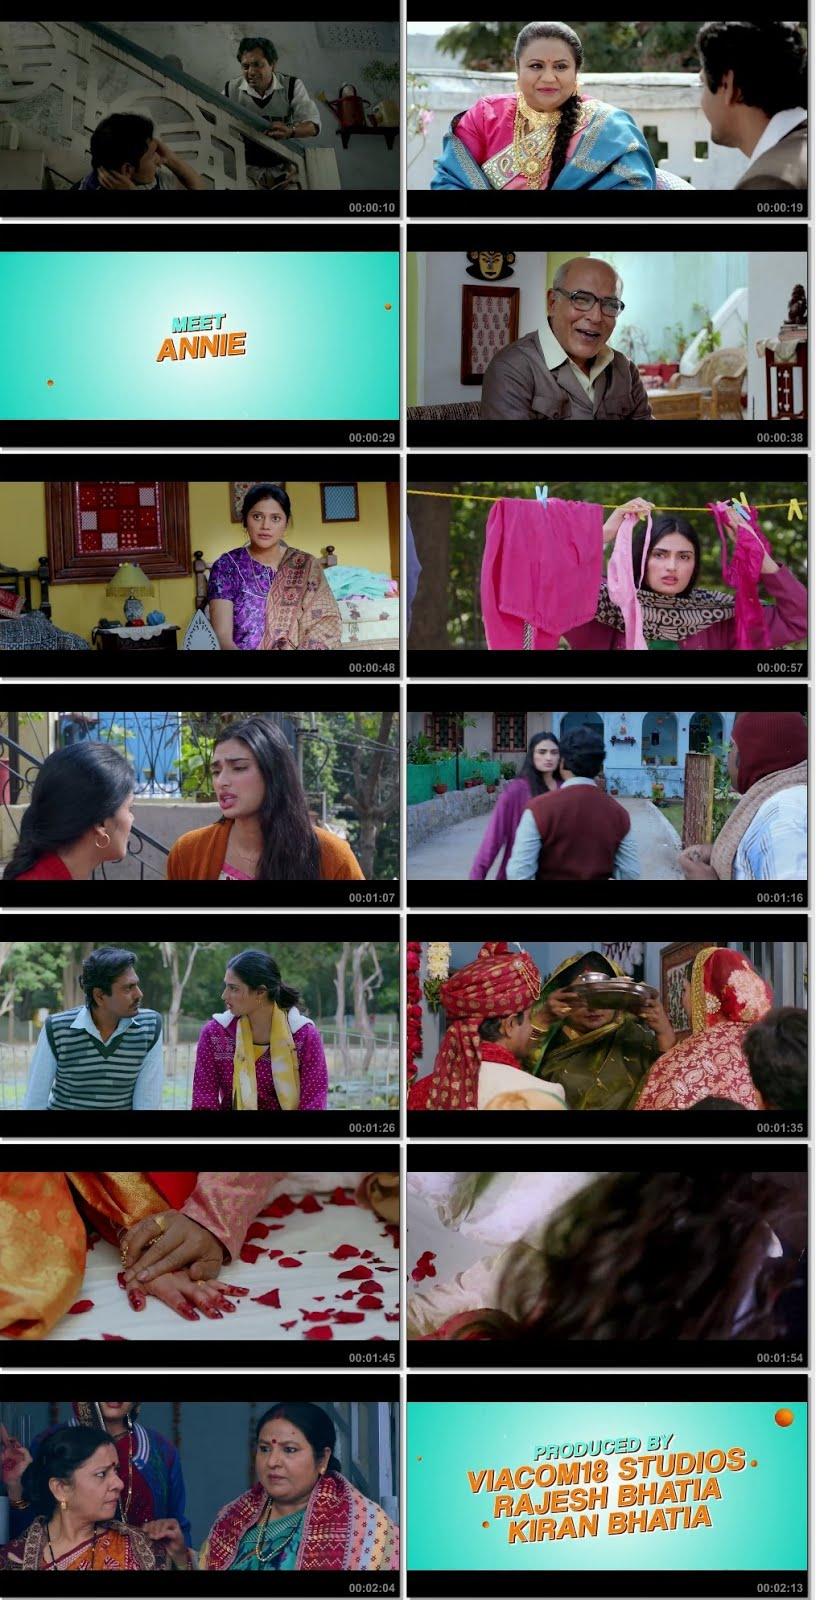 Motichoor Chaknachoor 2019 Hindi Movie Pre Dvdrip 700mb Downlaod Bollymaza Net